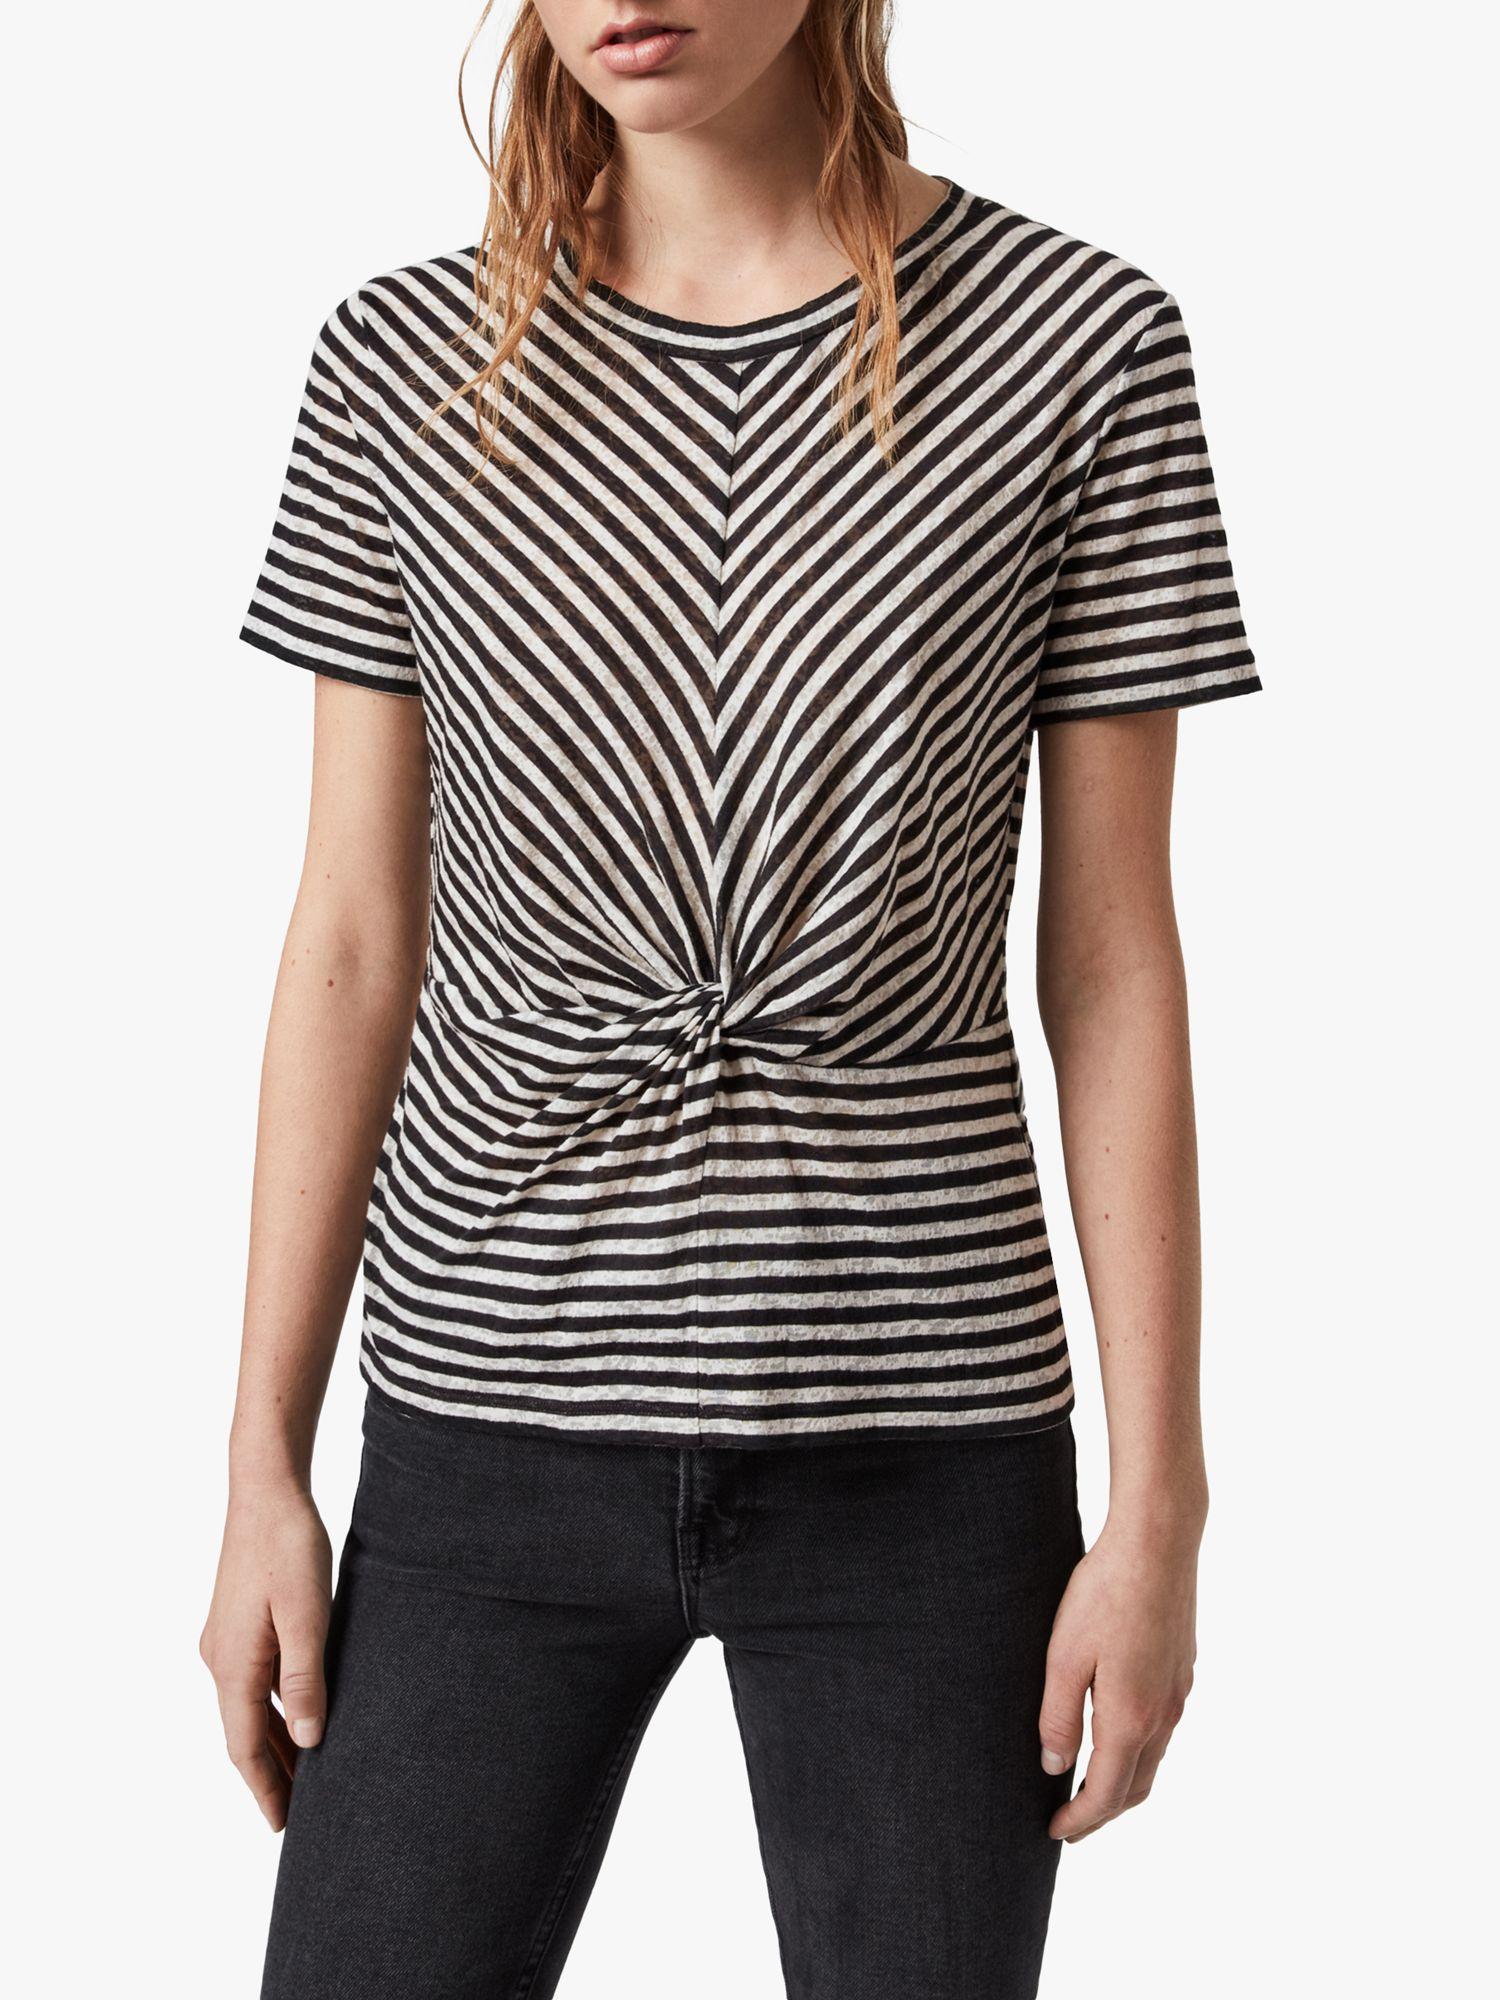 AllSaints AllSaints Jess Short Sleeve Stripe Top, Chalk/Ink Blue